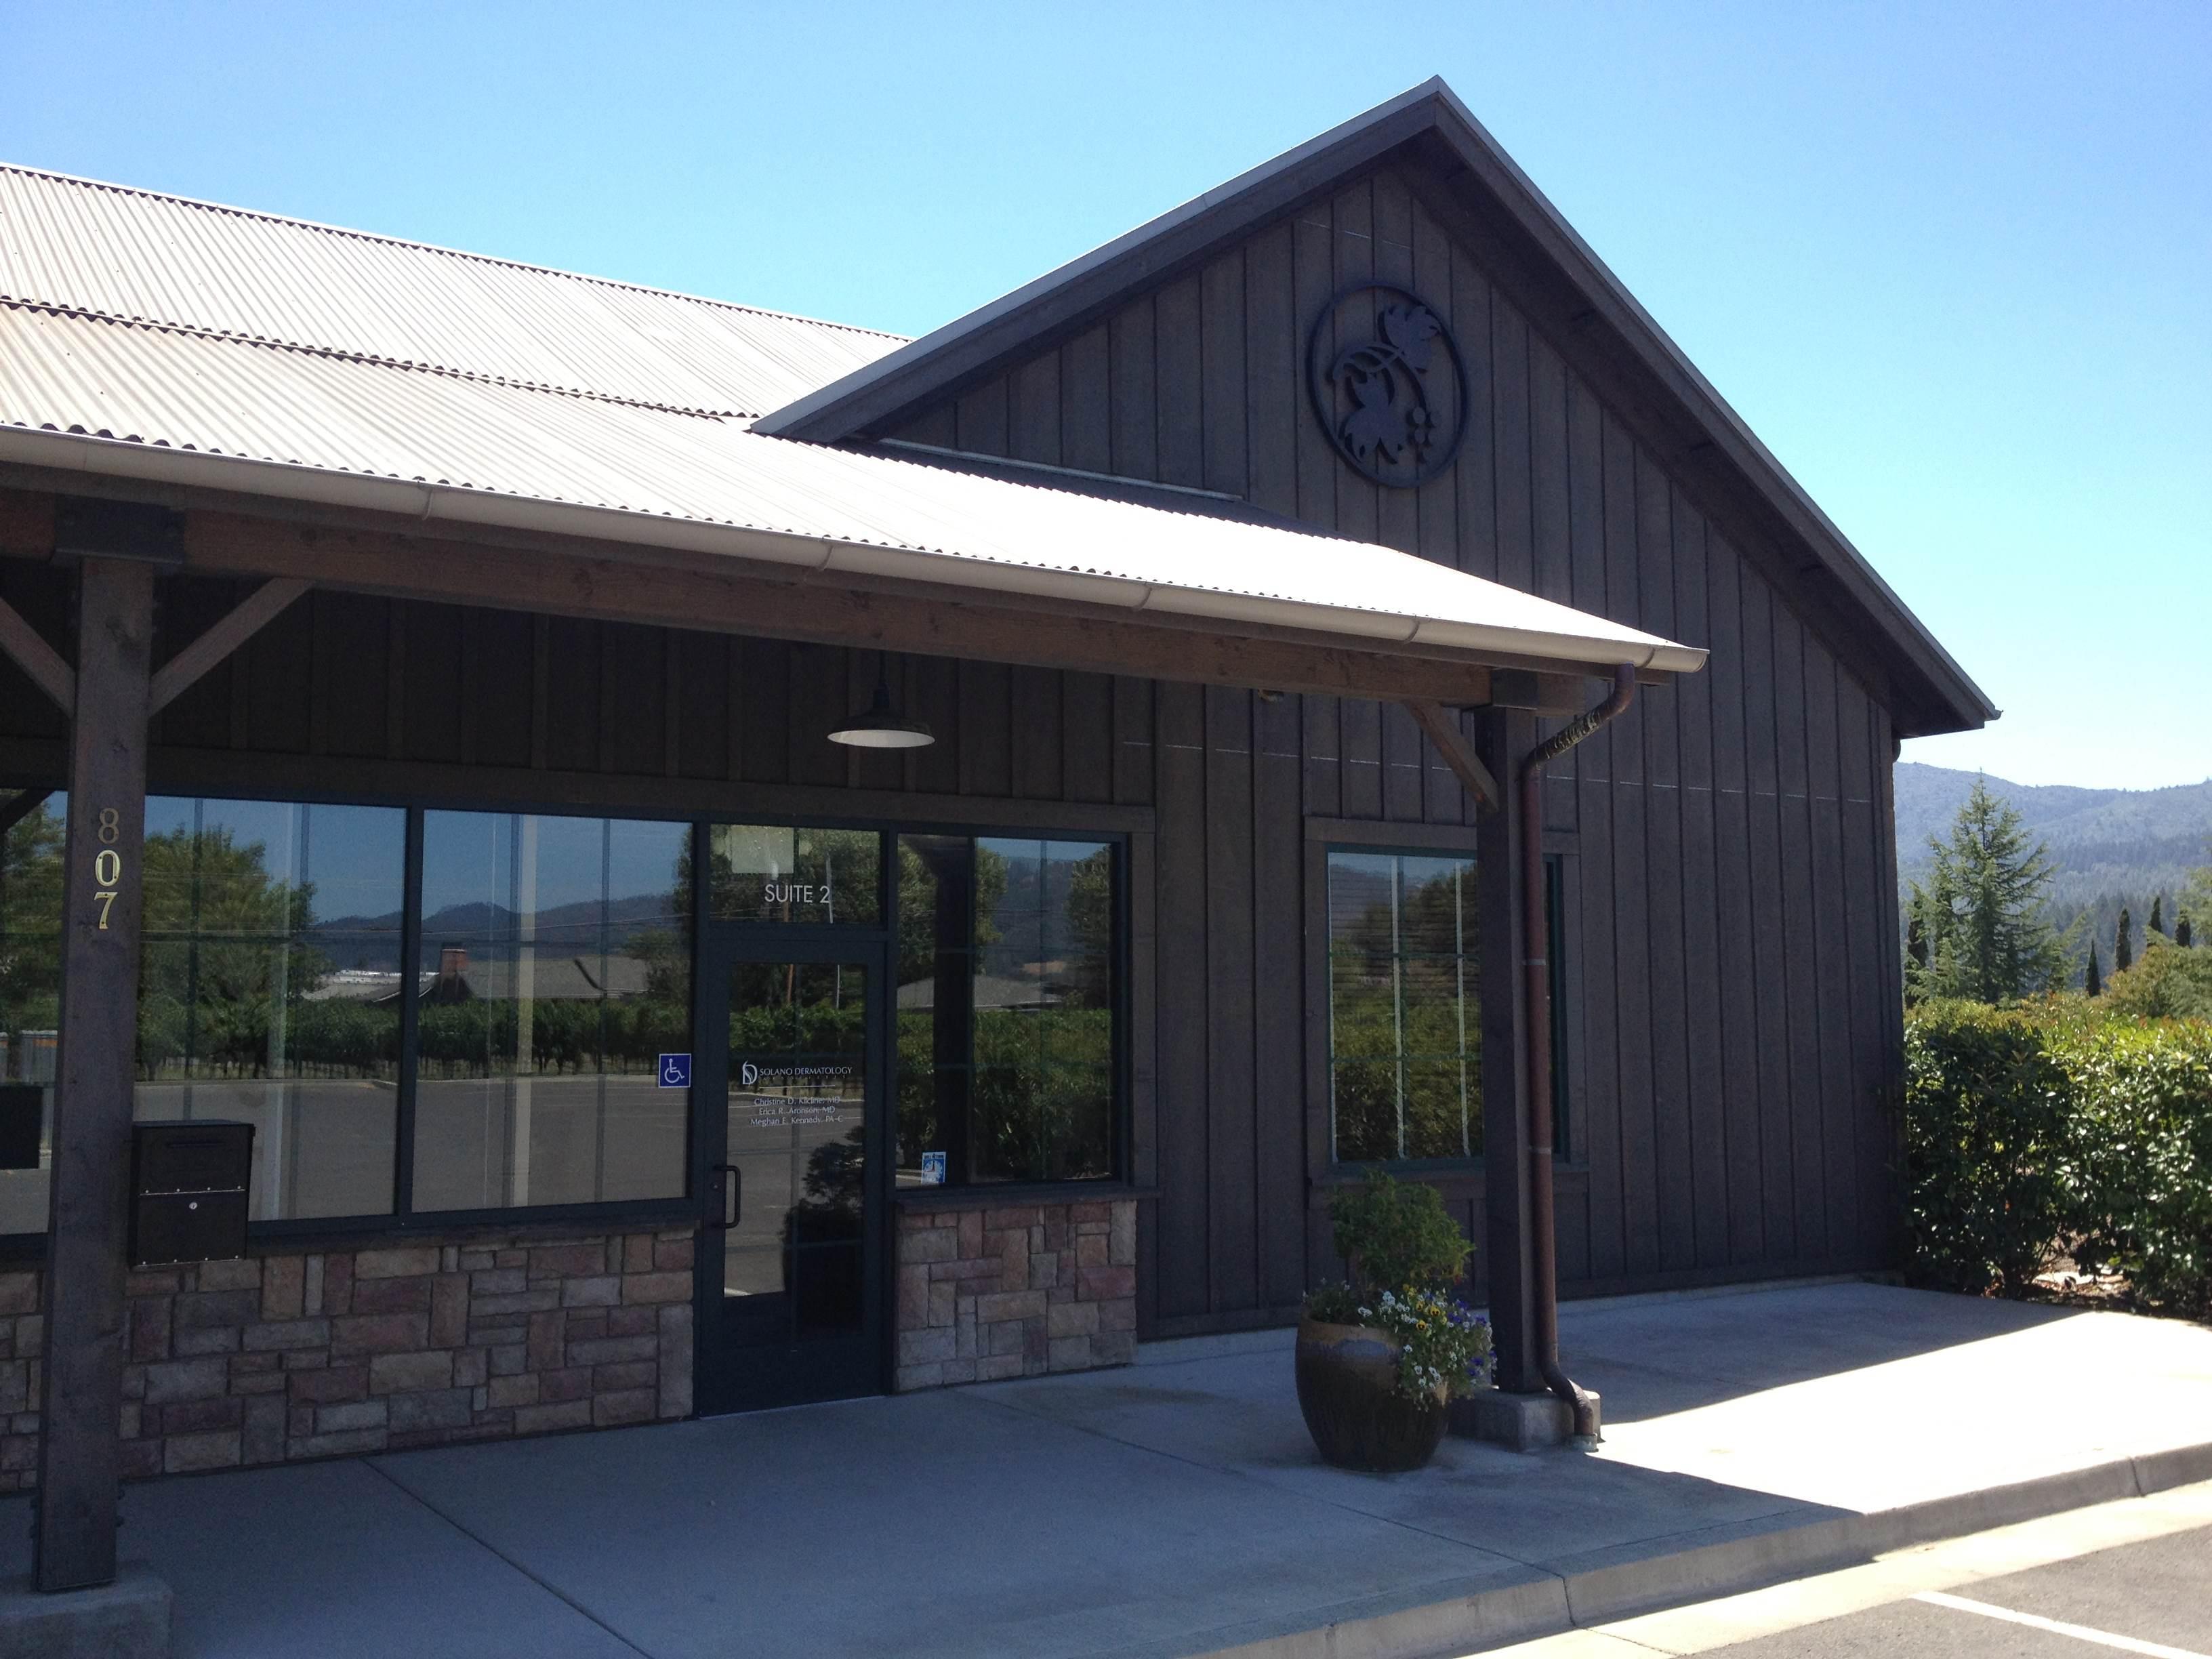 St. Helena Dermatology Office